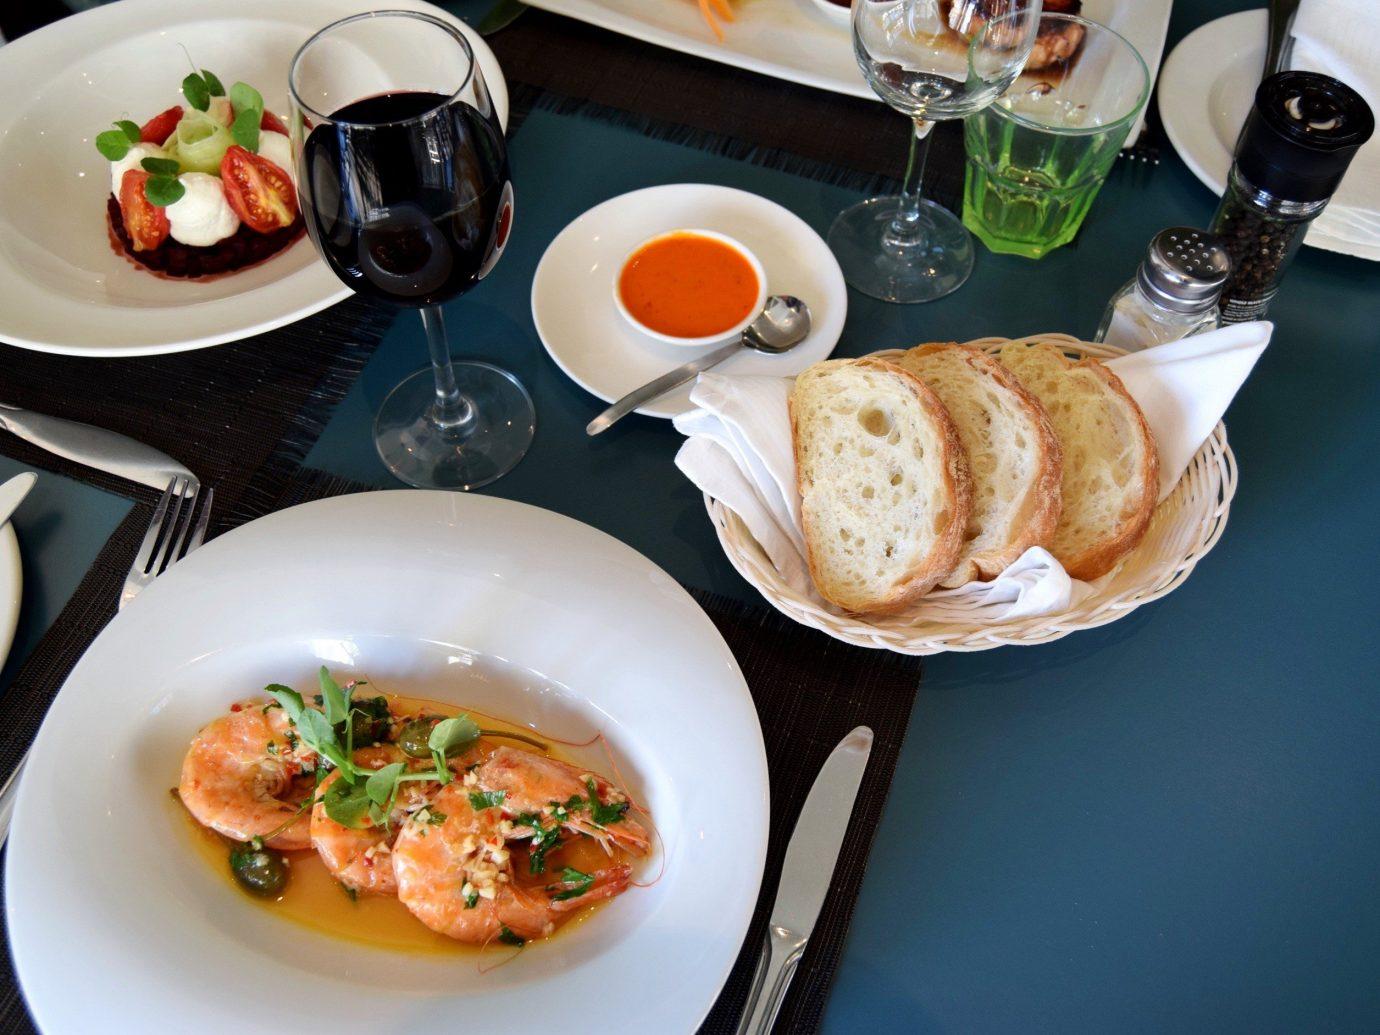 Food + Drink plate food table dish meal breakfast lunch brunch cuisine sense restaurant several piece de resistance